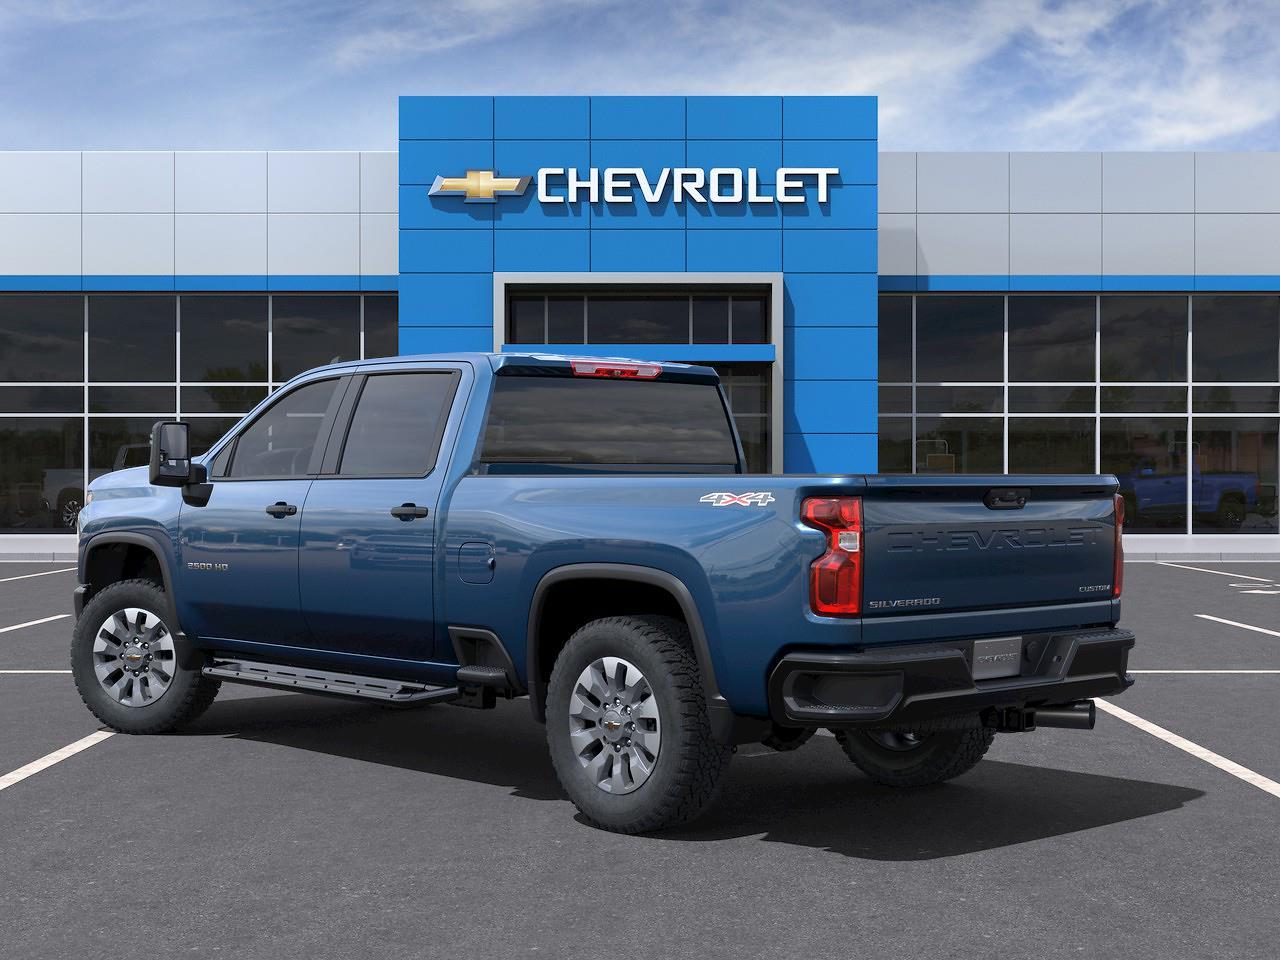 2021 Chevrolet Silverado 2500 Crew Cab 4x4, Pickup #Q210471 - photo 4